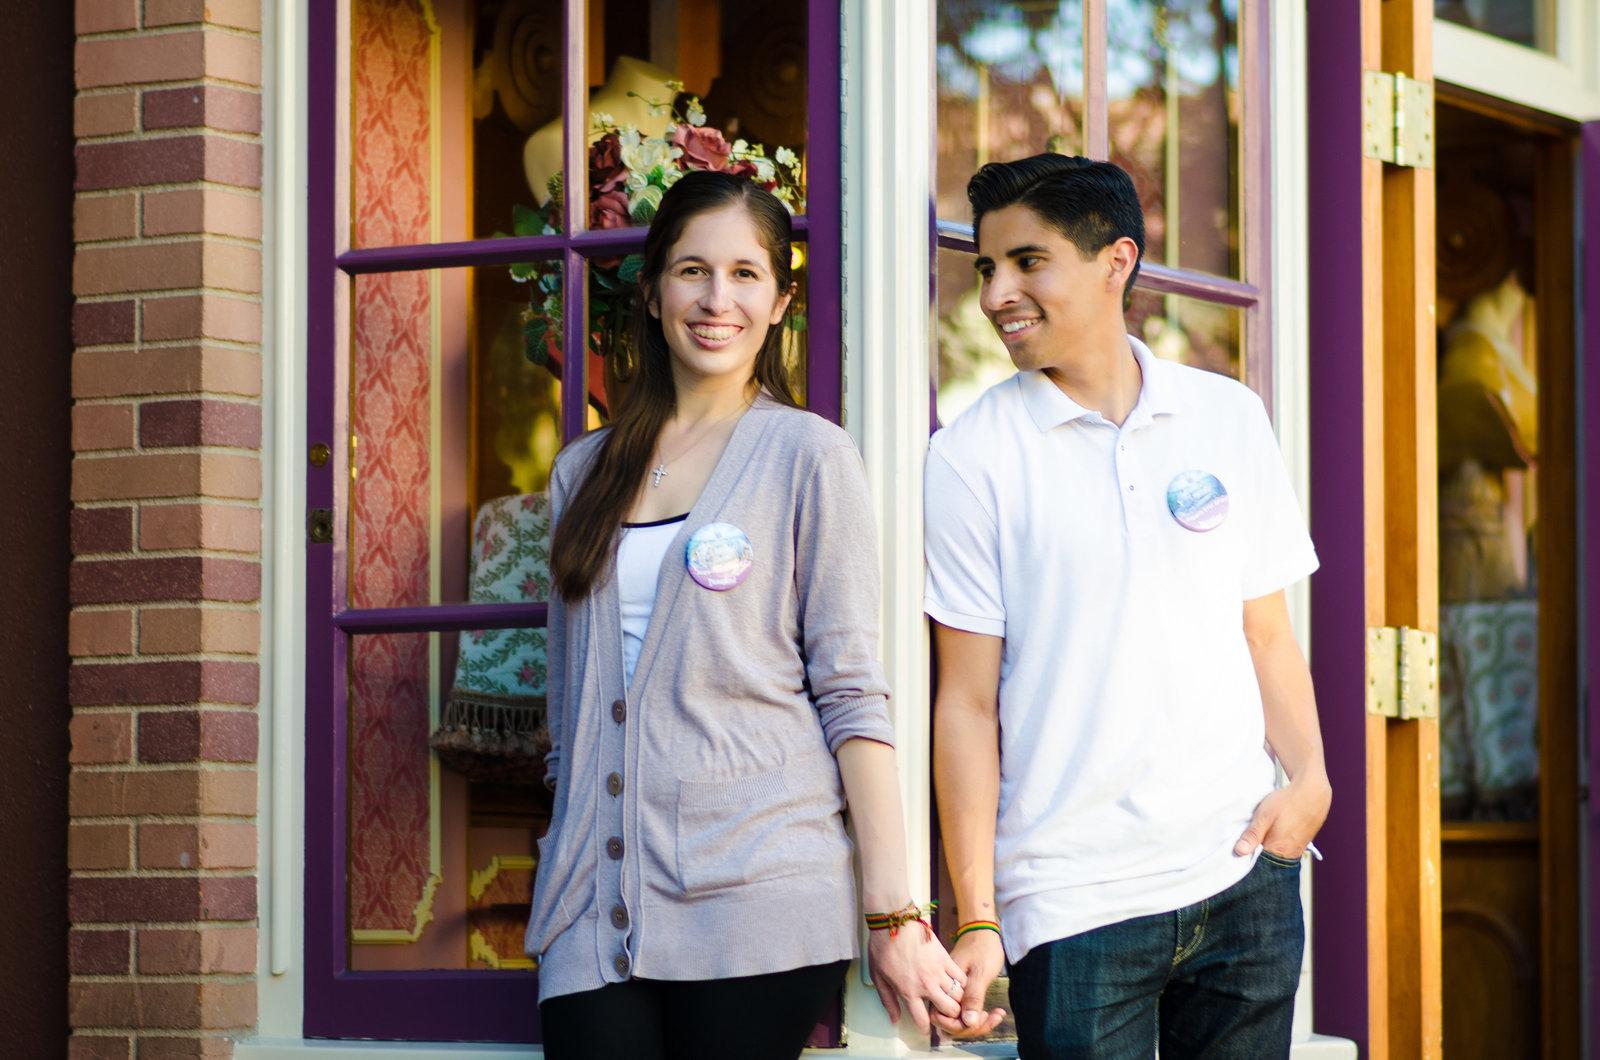 Disneyland+Engagement+Photos+J-2424163916-O